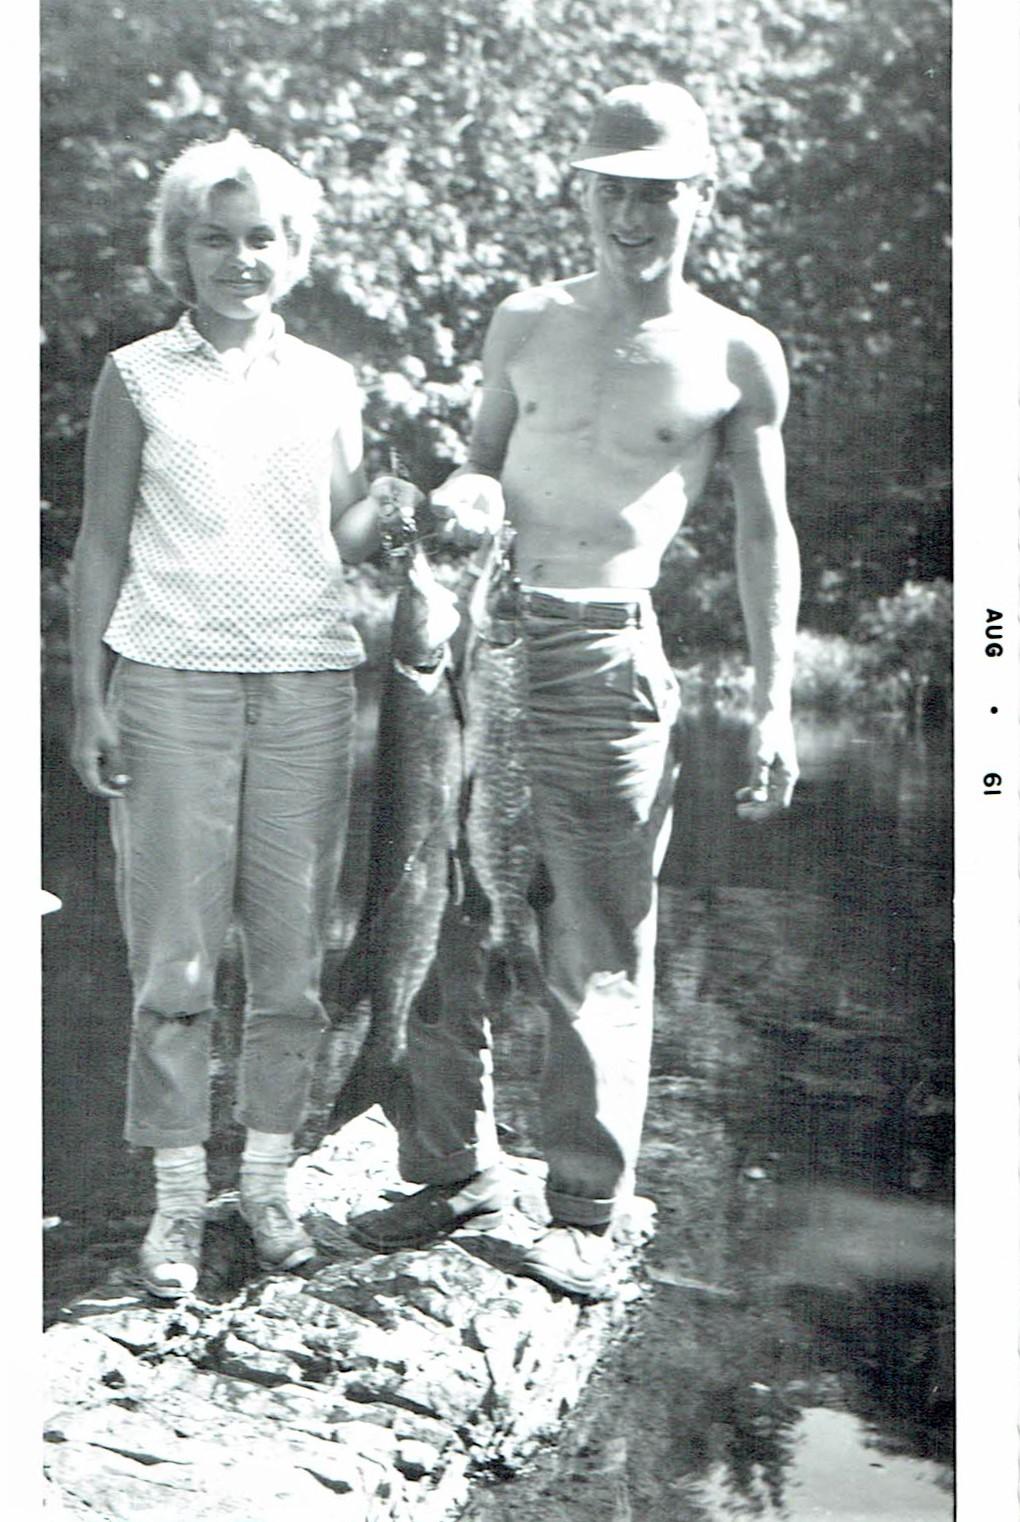 Mary Gulas and Bill Conkright, Beaver Creek, l961